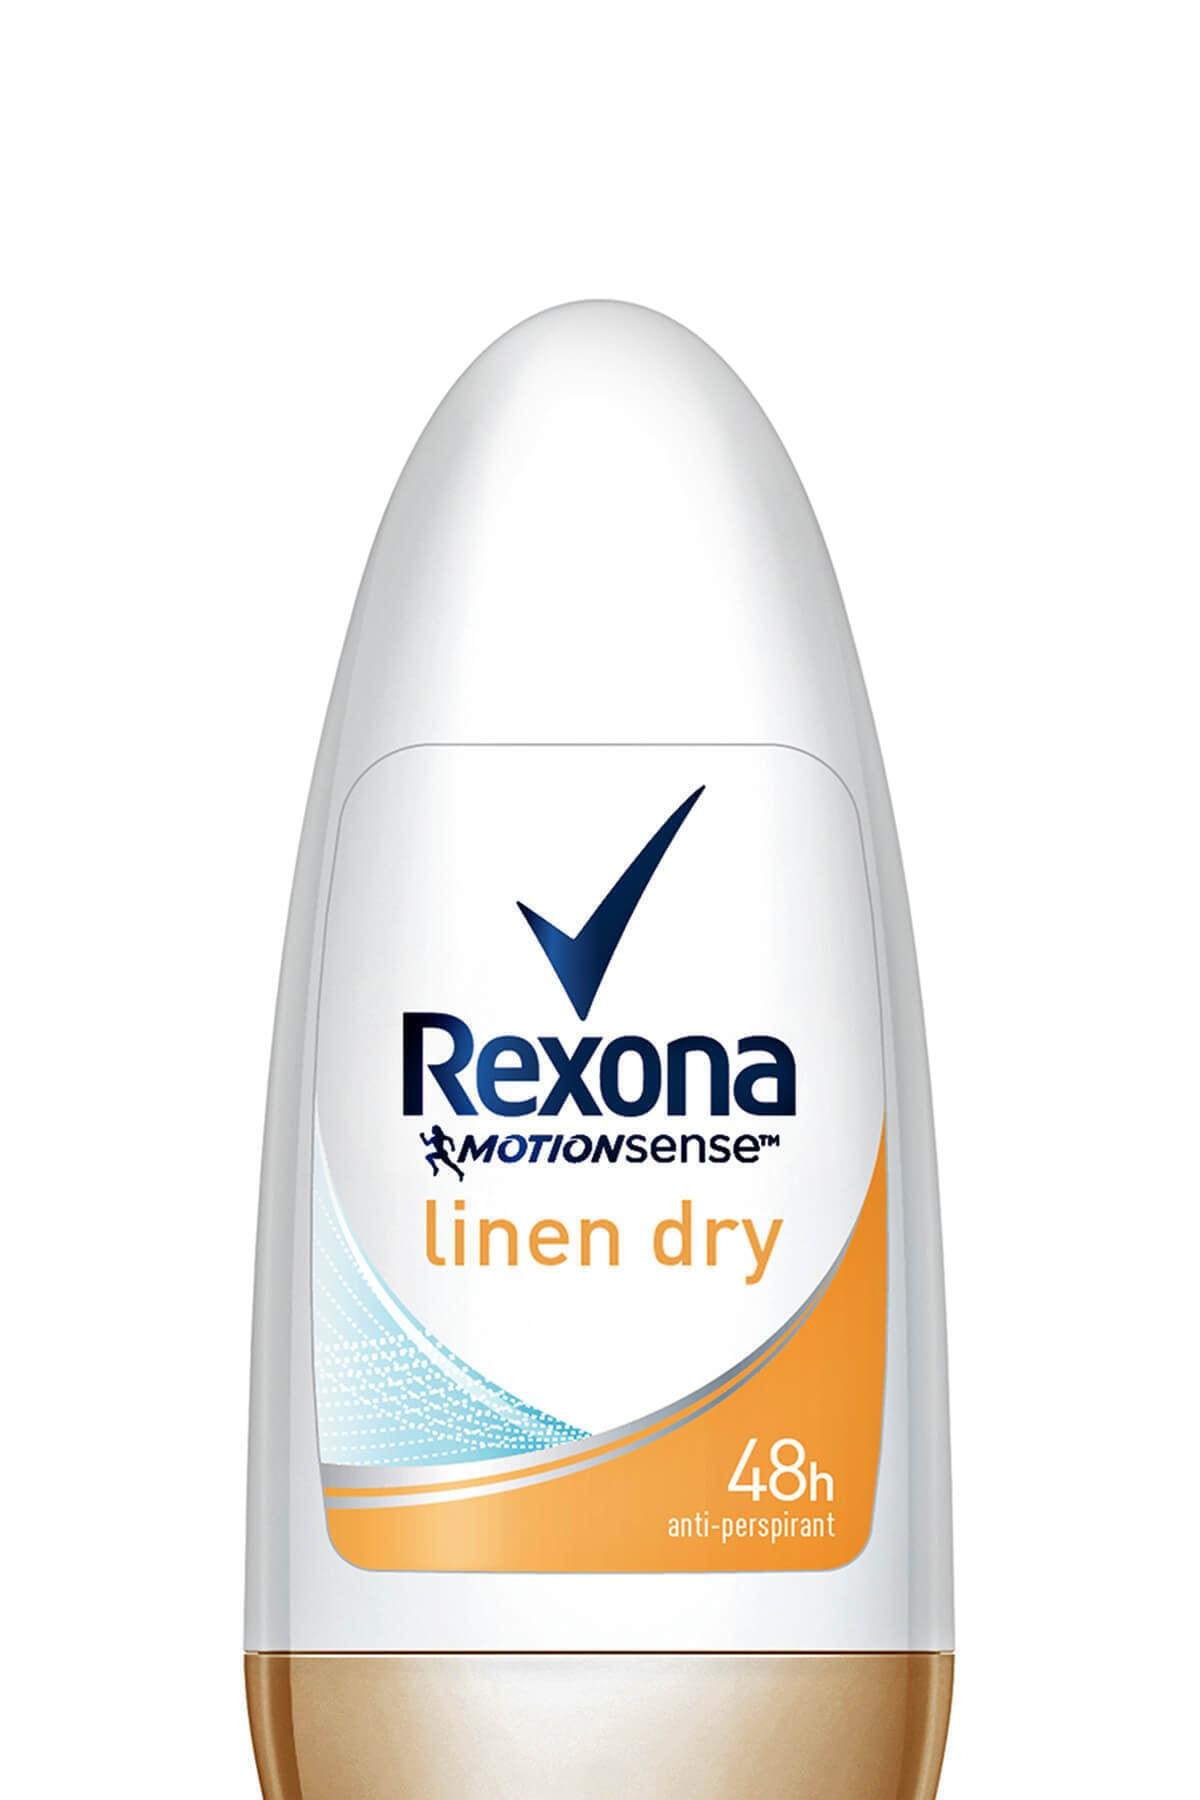 Rexona Linen Dry 48h Anti-perspirant Deodorant Roll-on 50 ml 2